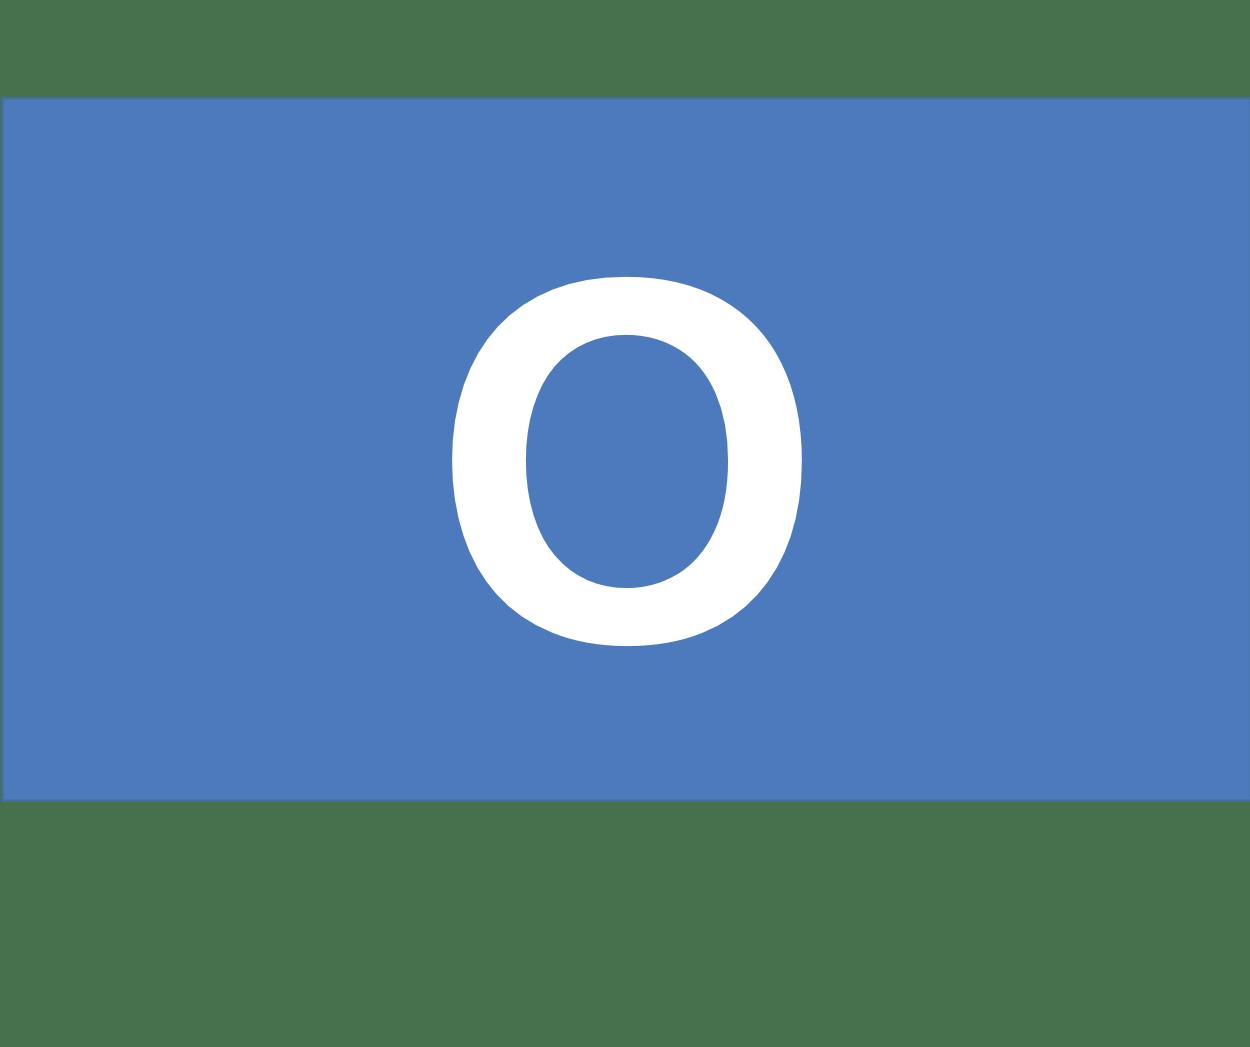 8 O 酸素 Oxygen 元素 記号 周期表 化学 原子